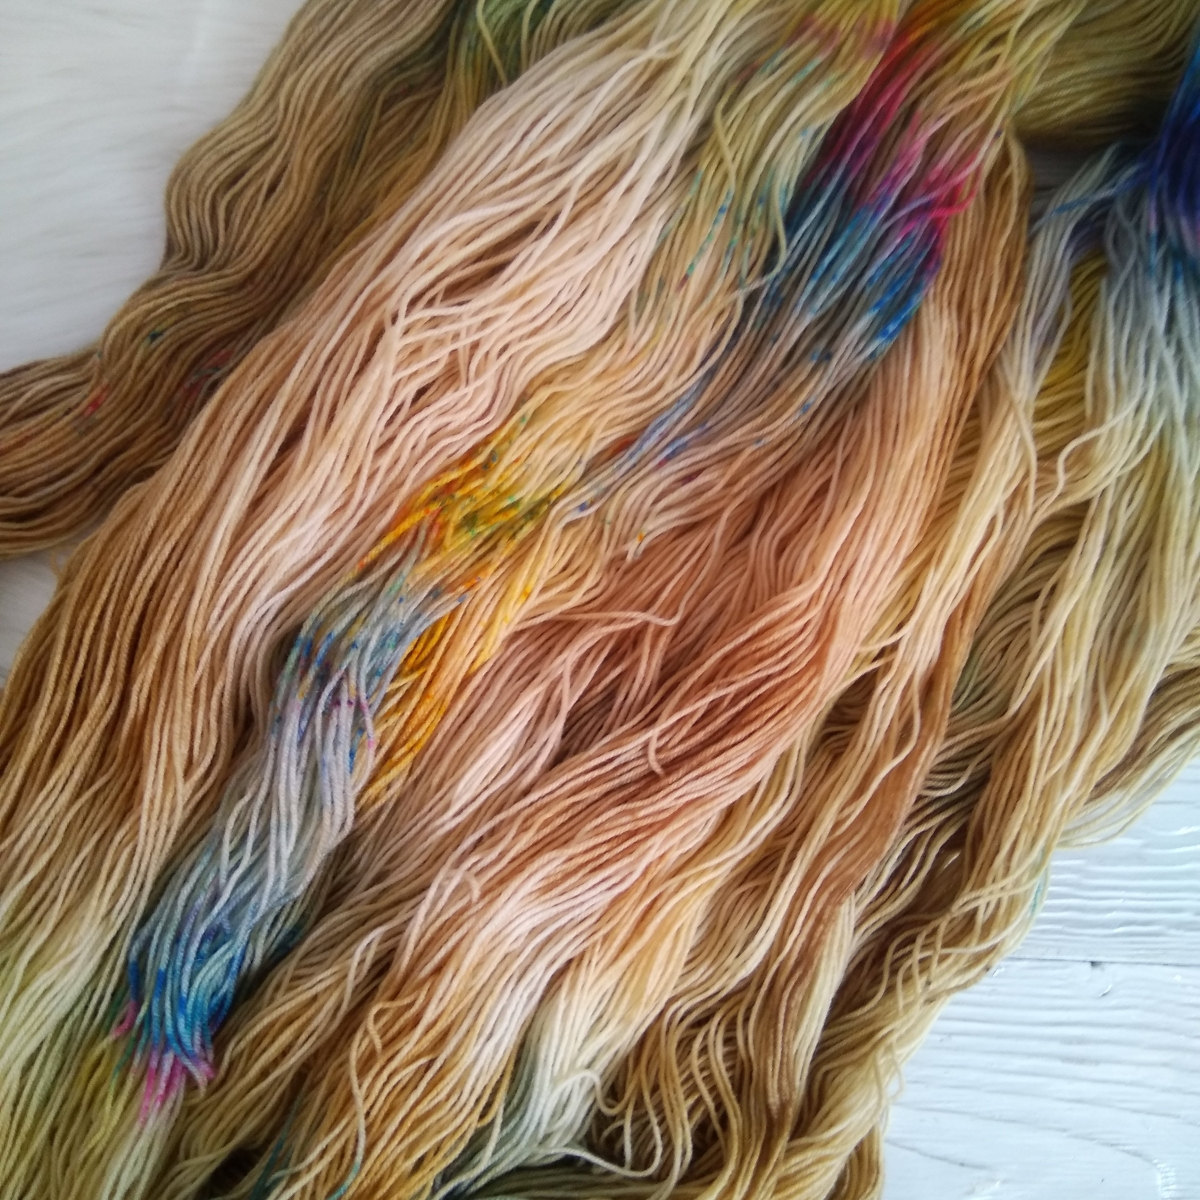 woodico.pro hand dyed yarn 032 3 1200x1200 - Hand dyed yarn / 032